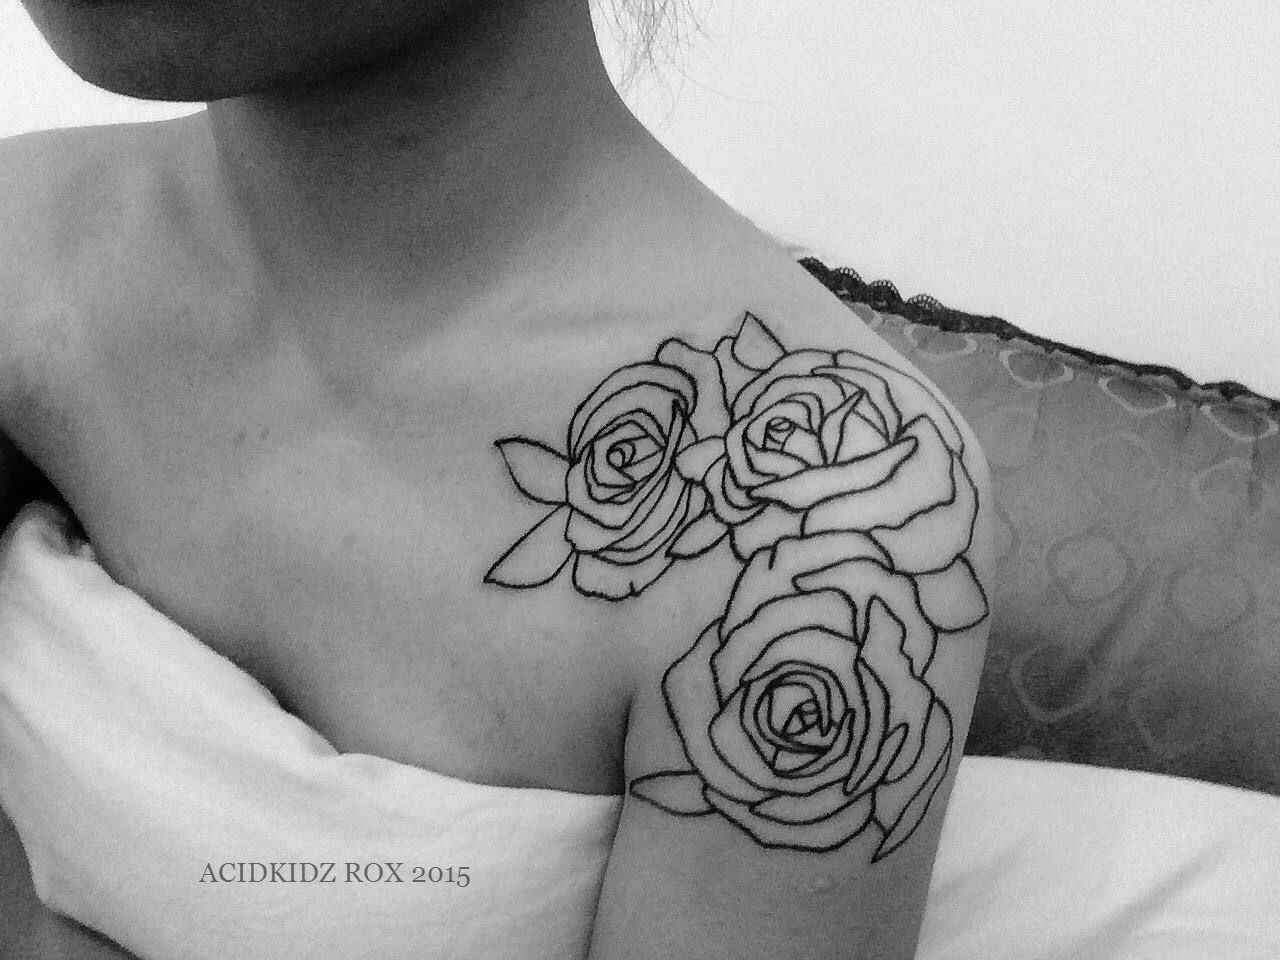 taiwan kaohsiung roxiehart666 acidkidz tattoo shoulder rose